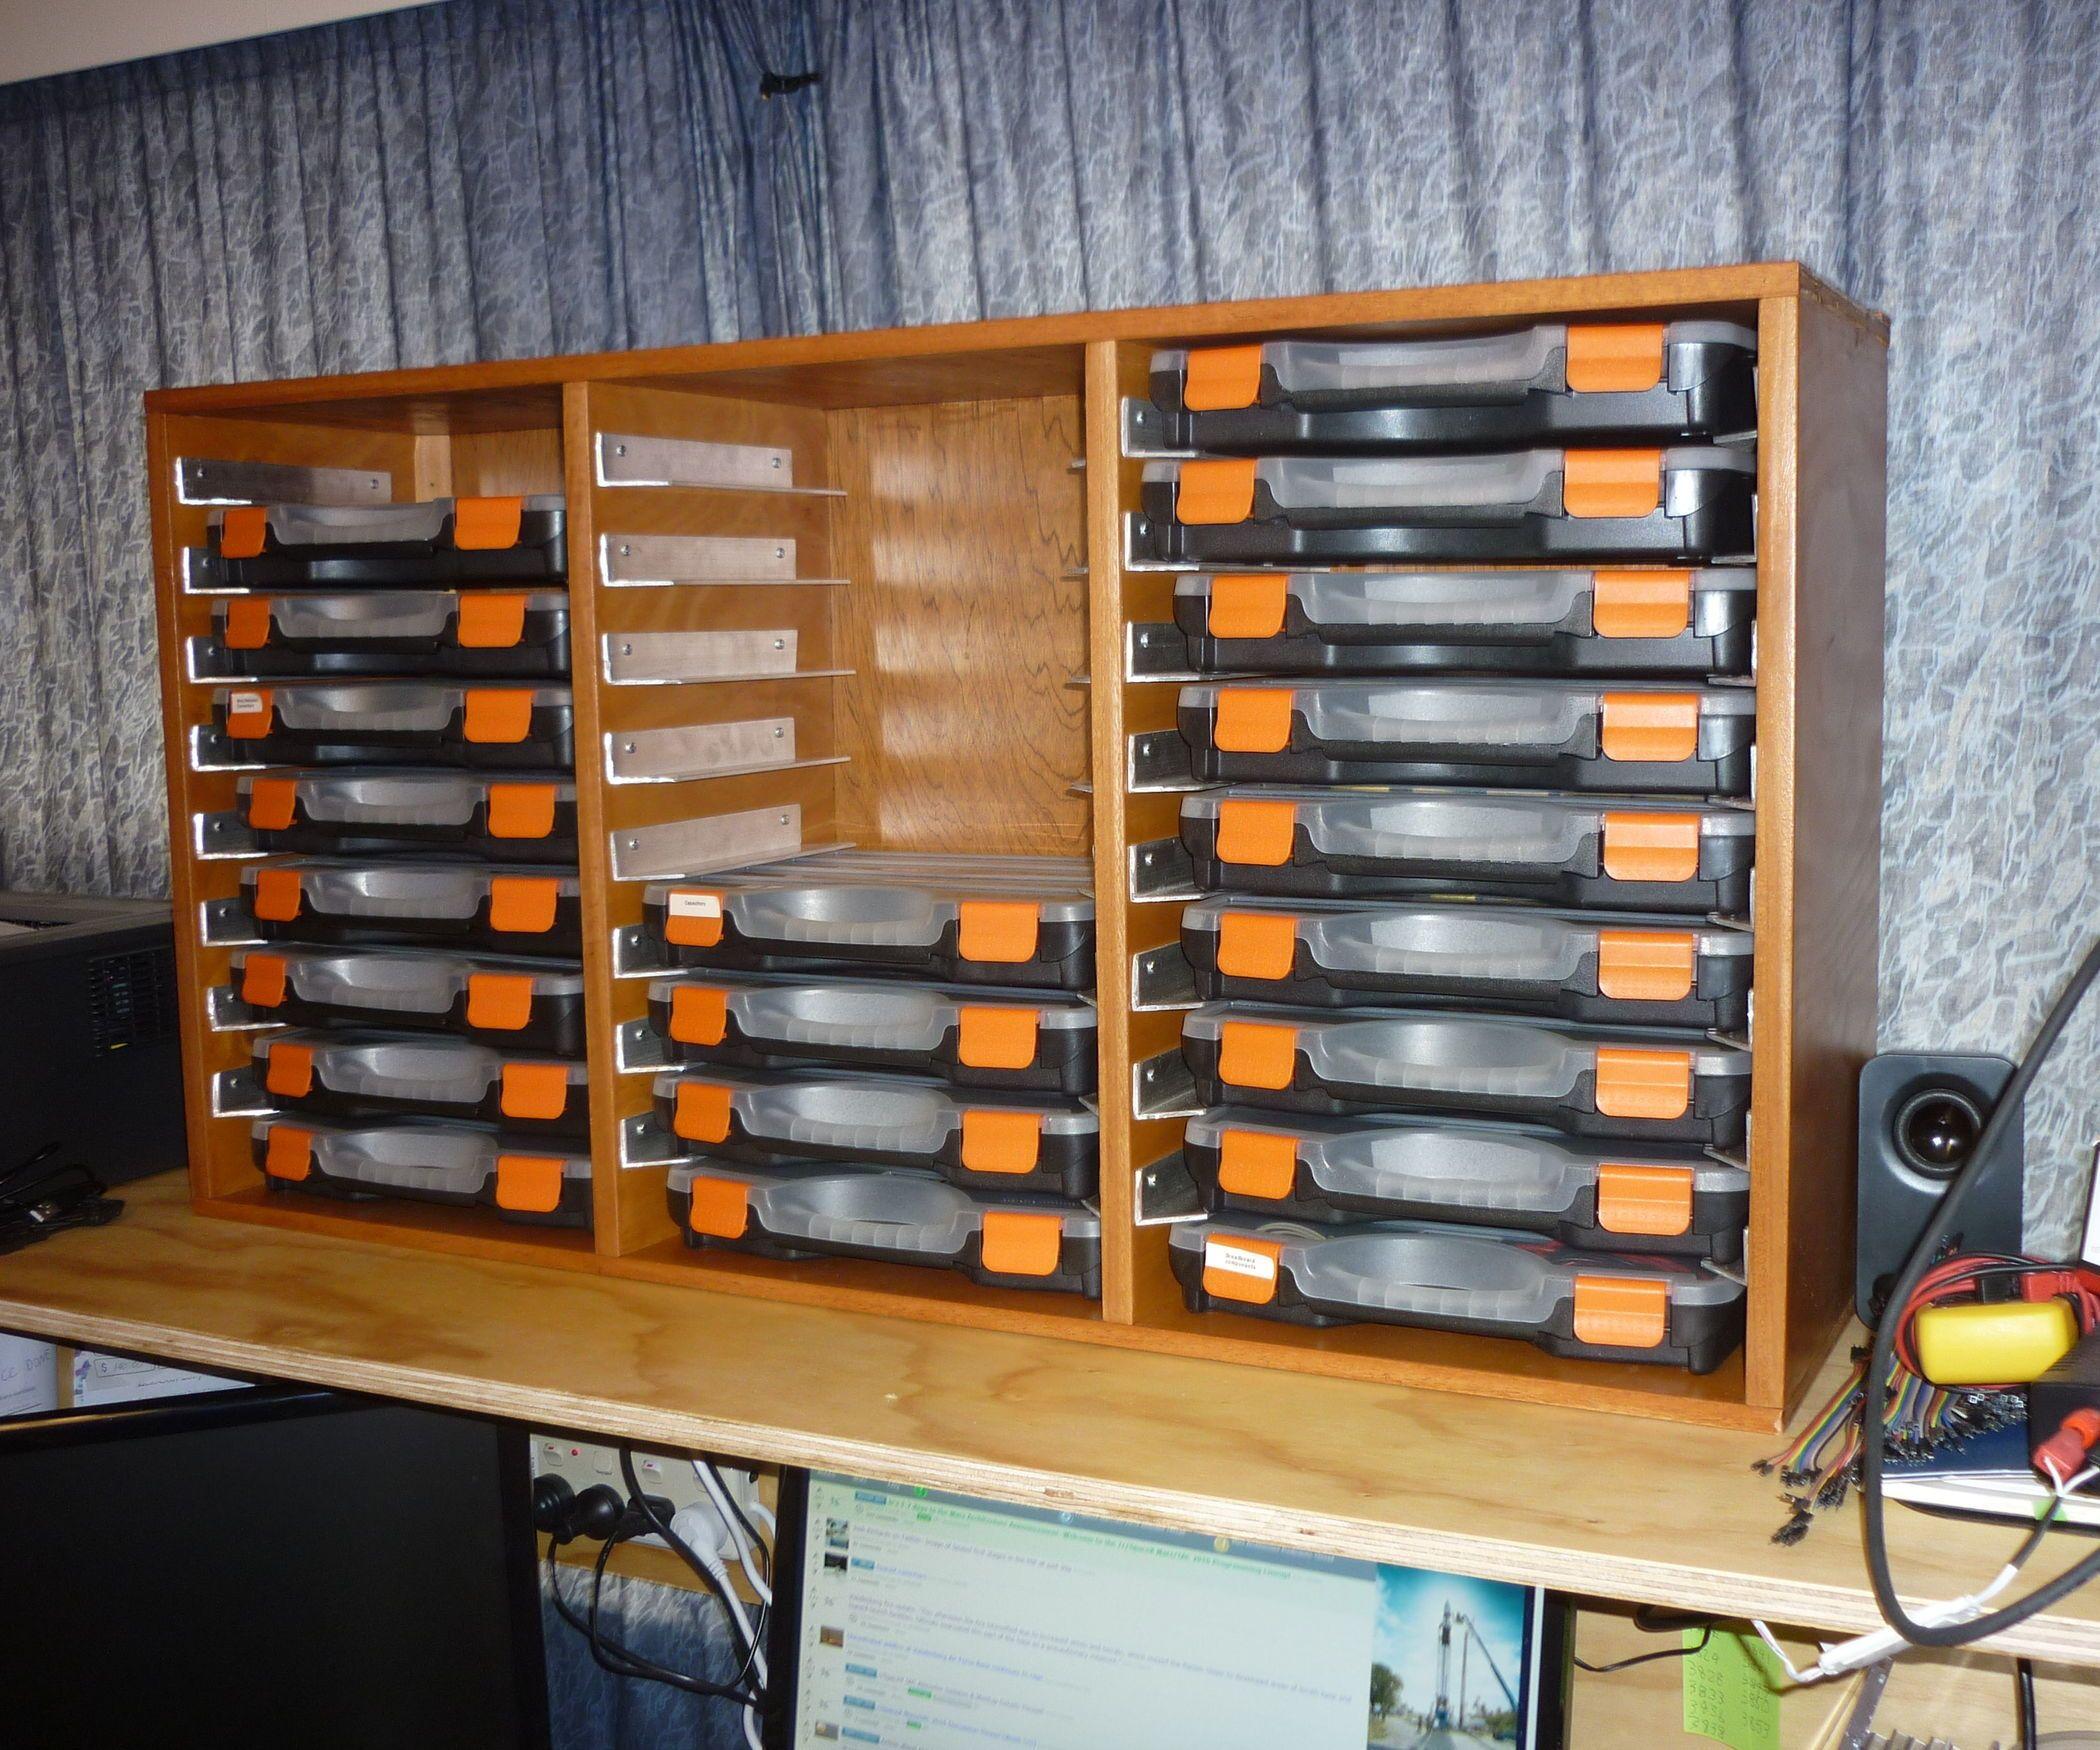 Electronics Components Storage Electronics Organization Storage Hardware Storage Storage